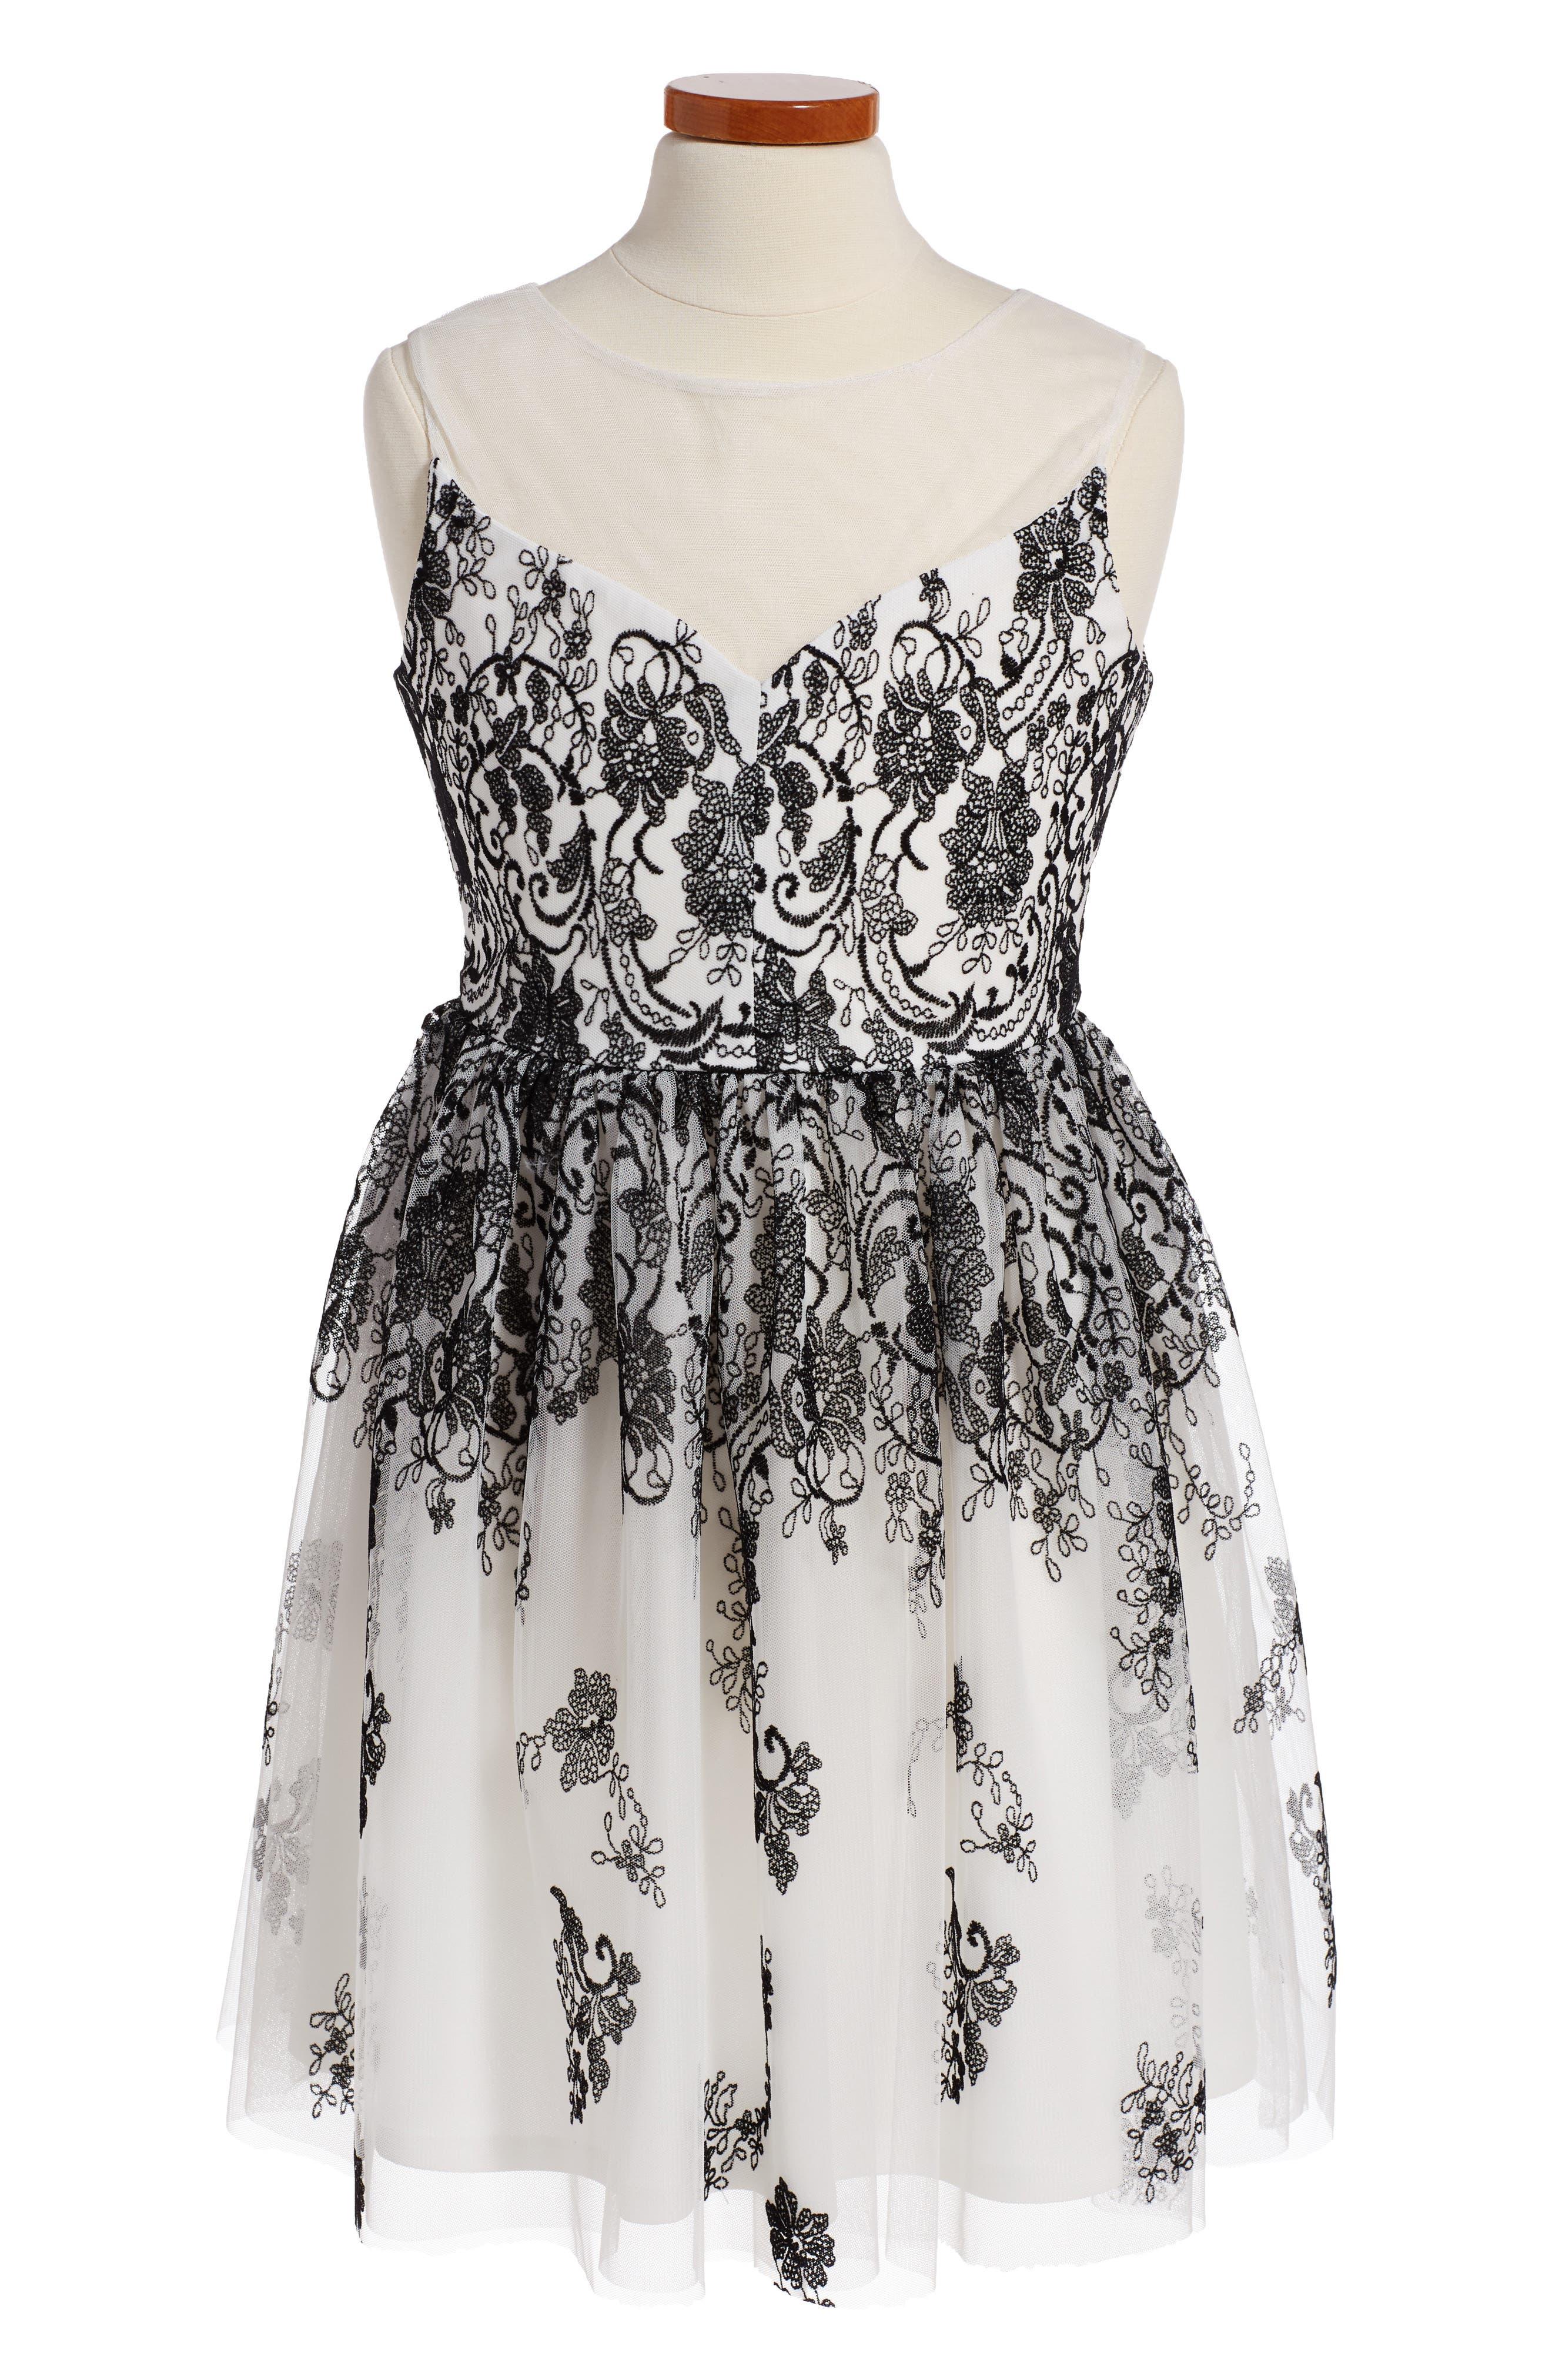 FRAIS Illusion Mesh Dress